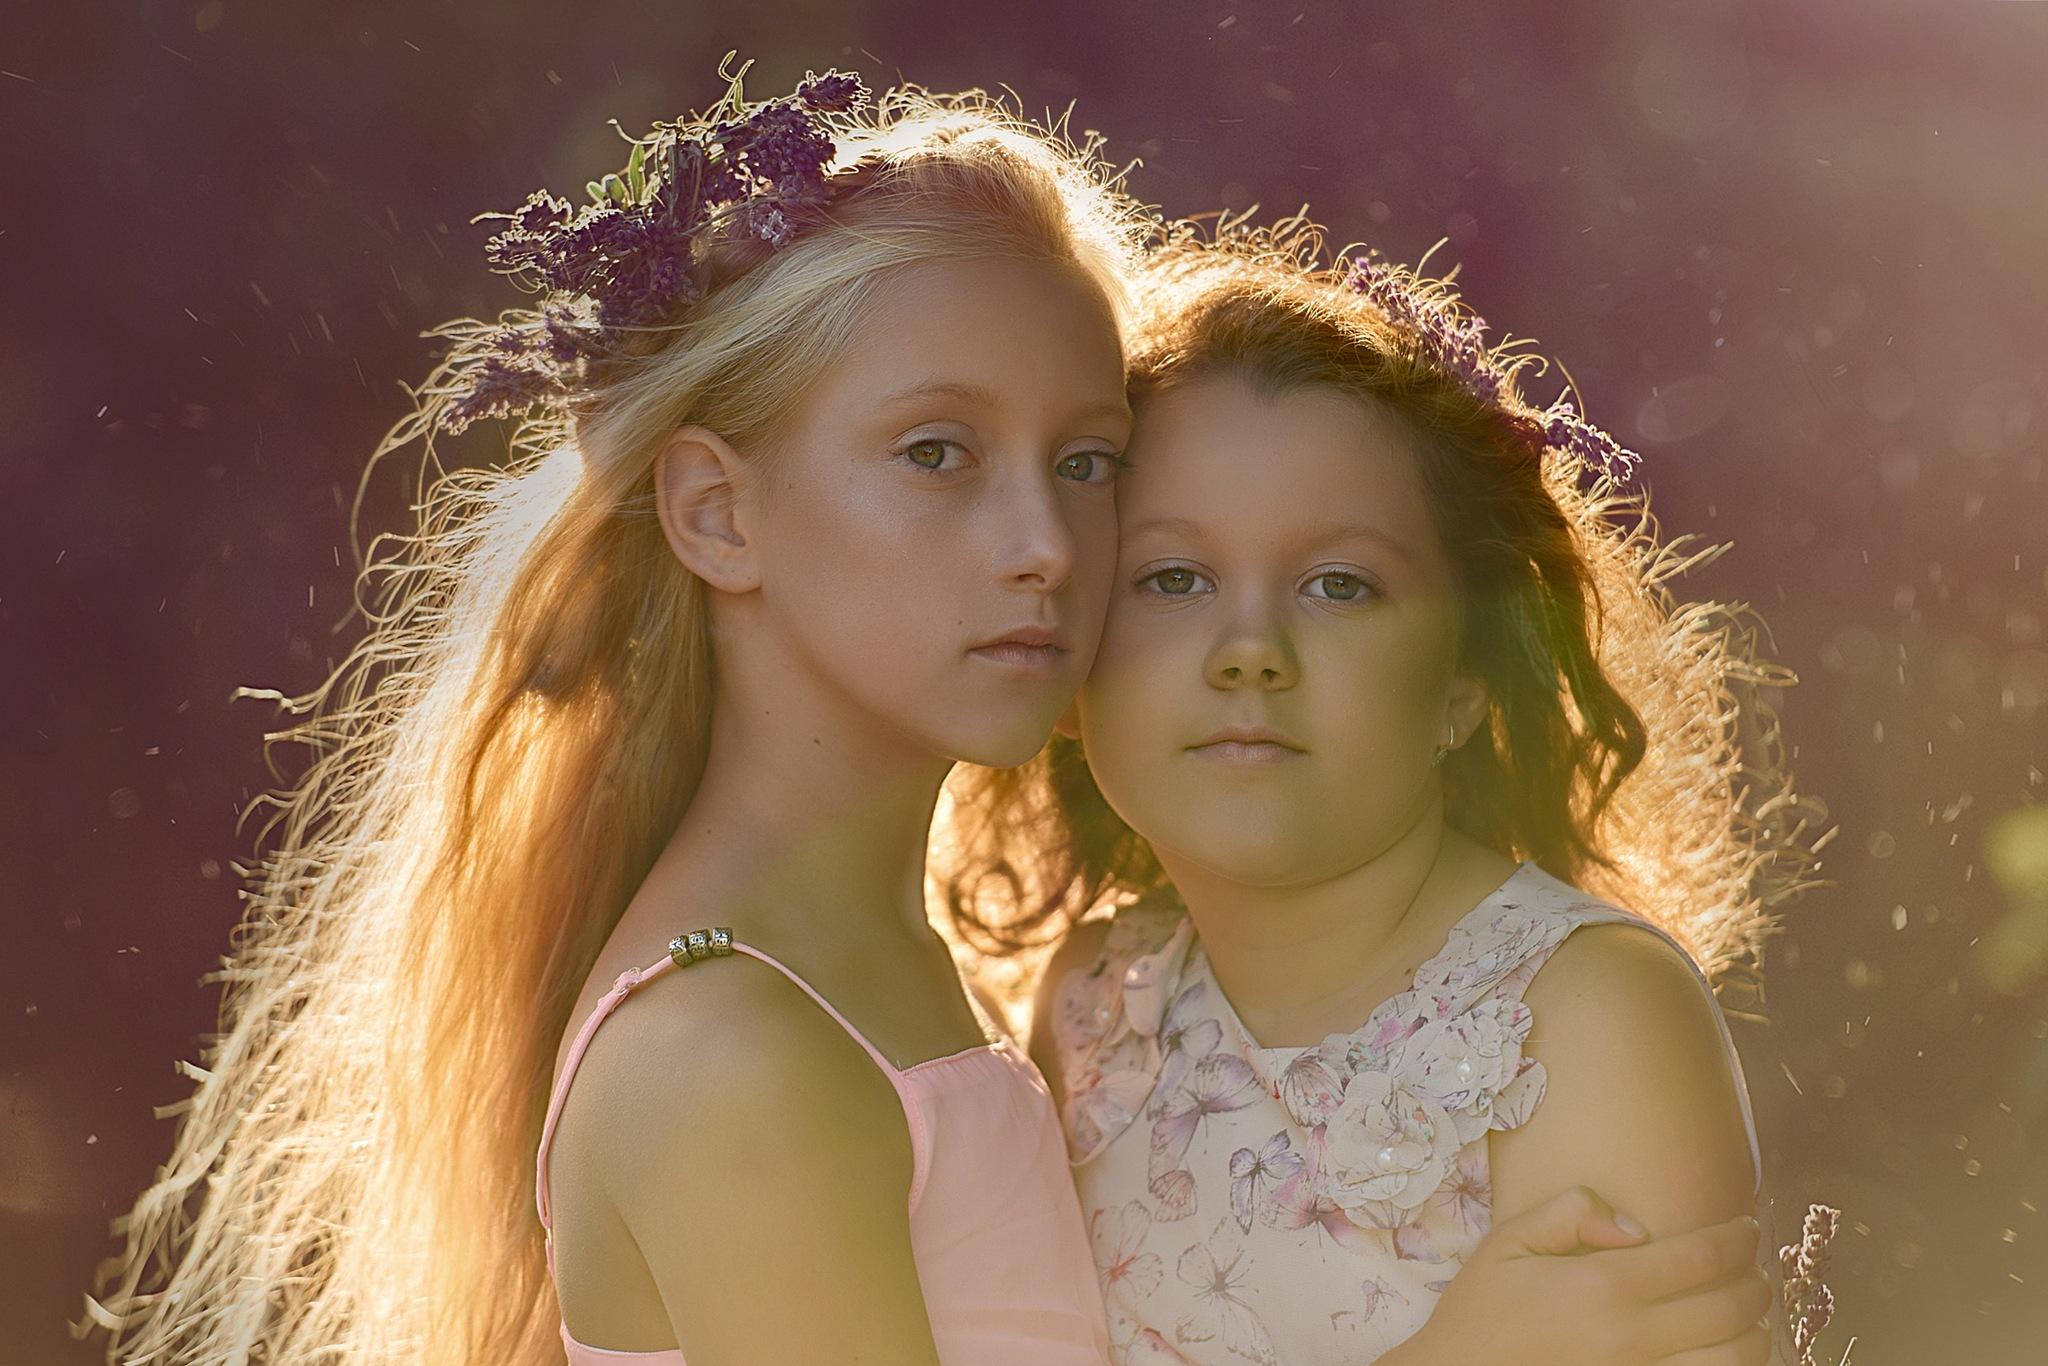 Lavender dream by anna.scigaj.7